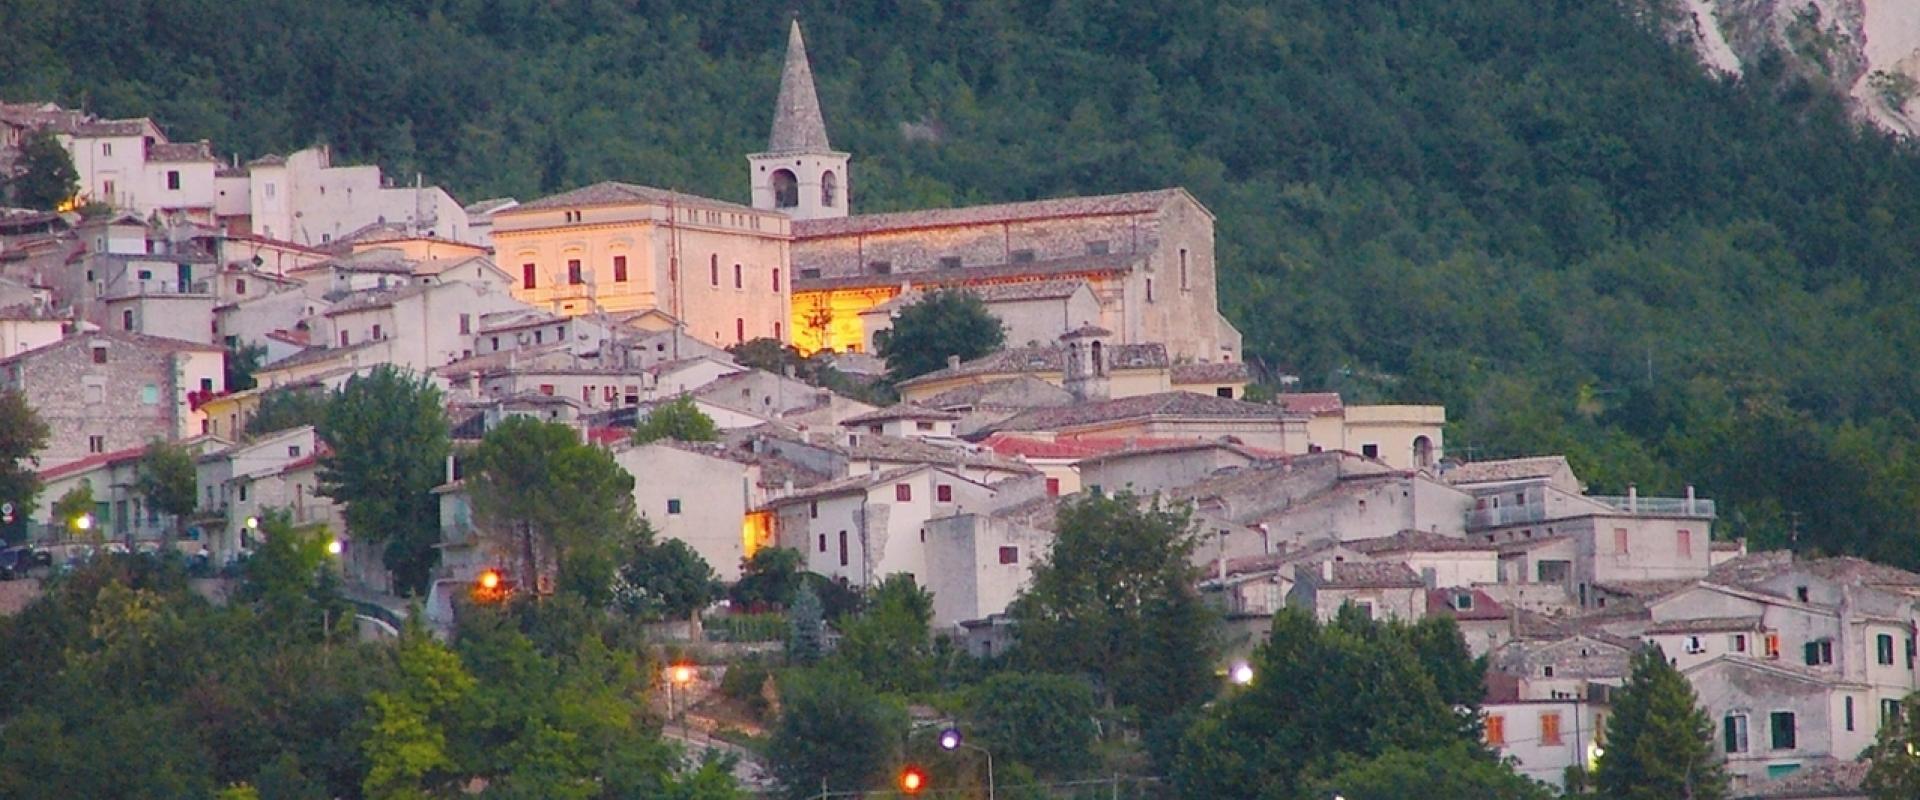 Caramanico Terme Abruzzo